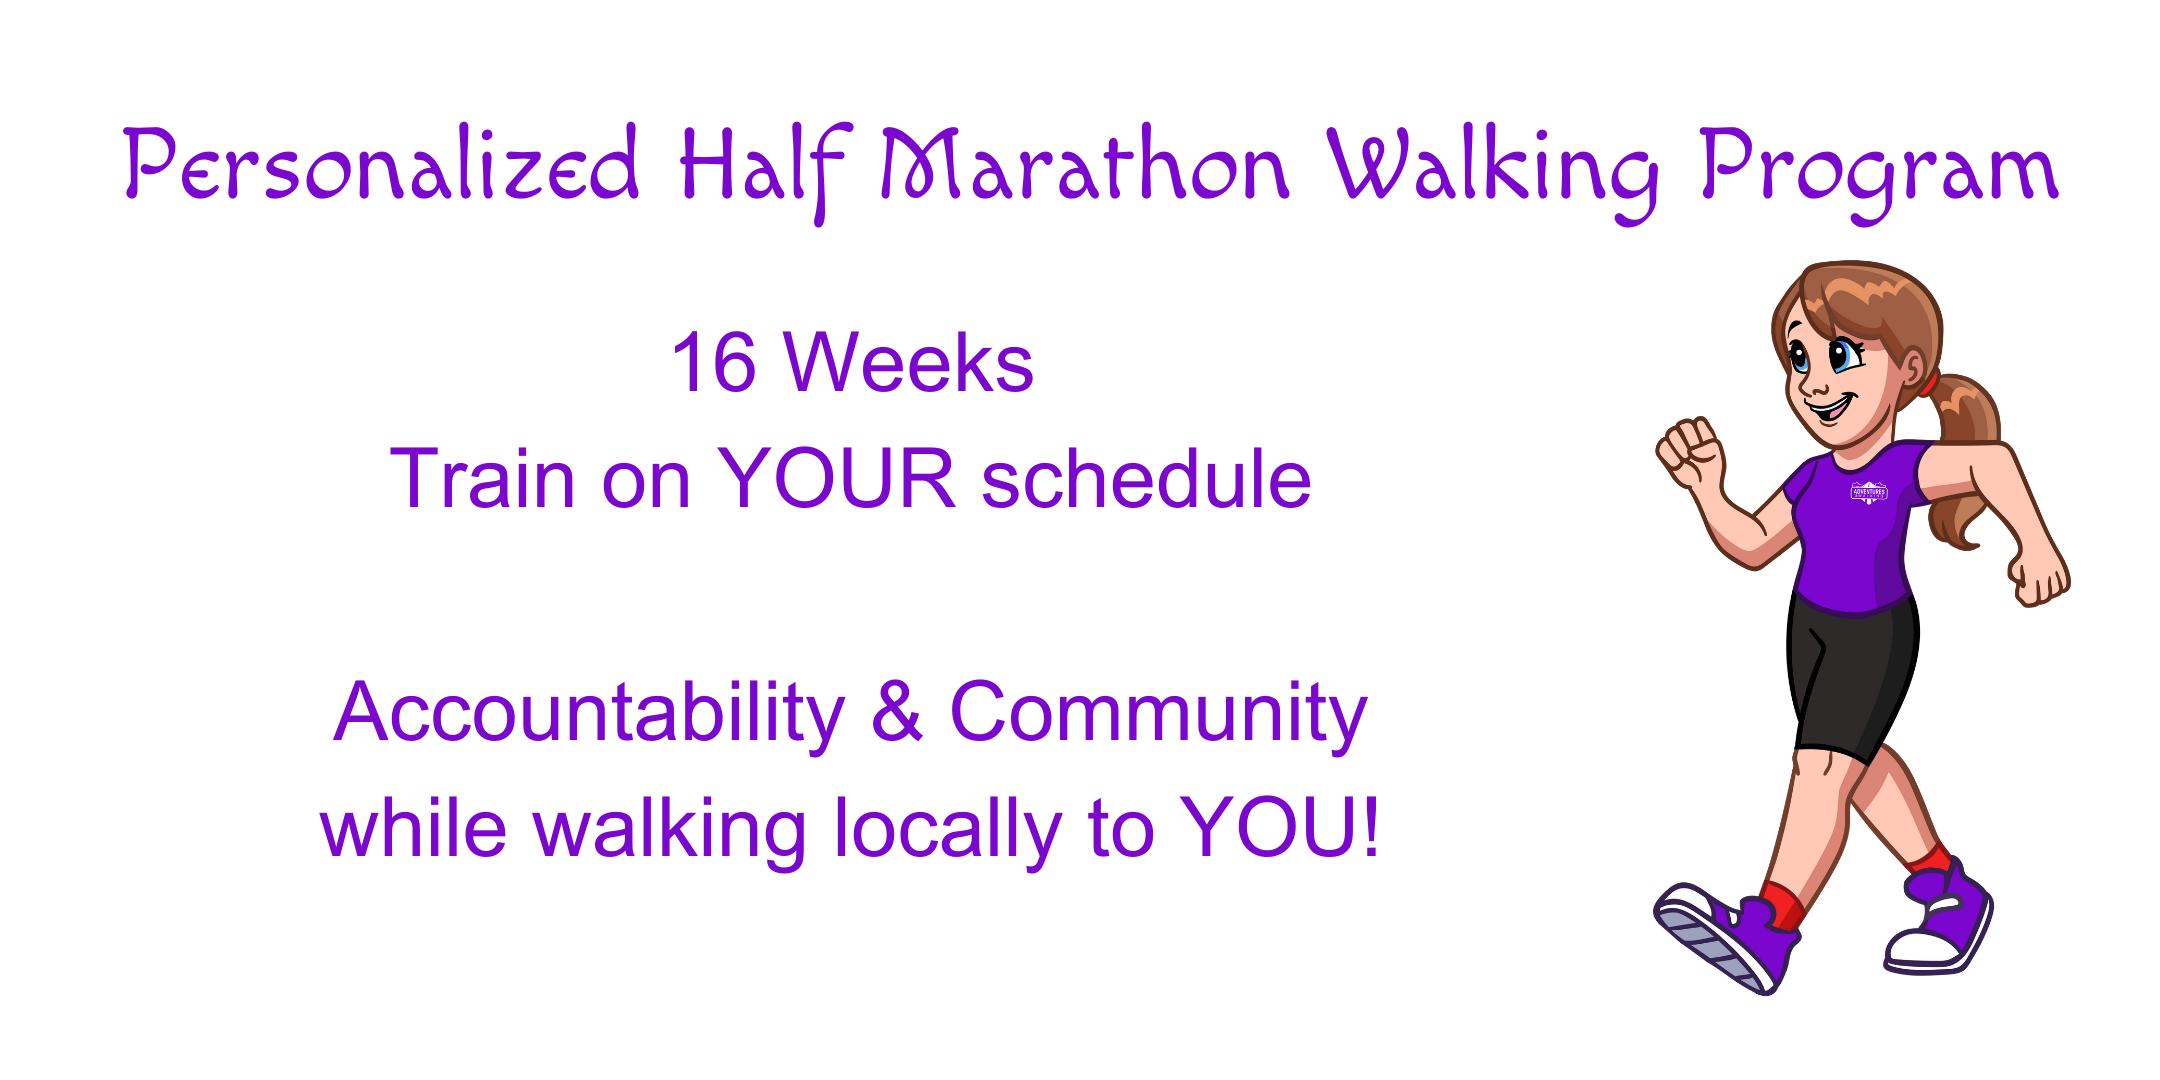 Personalized Half Marathon Walking Program - summary